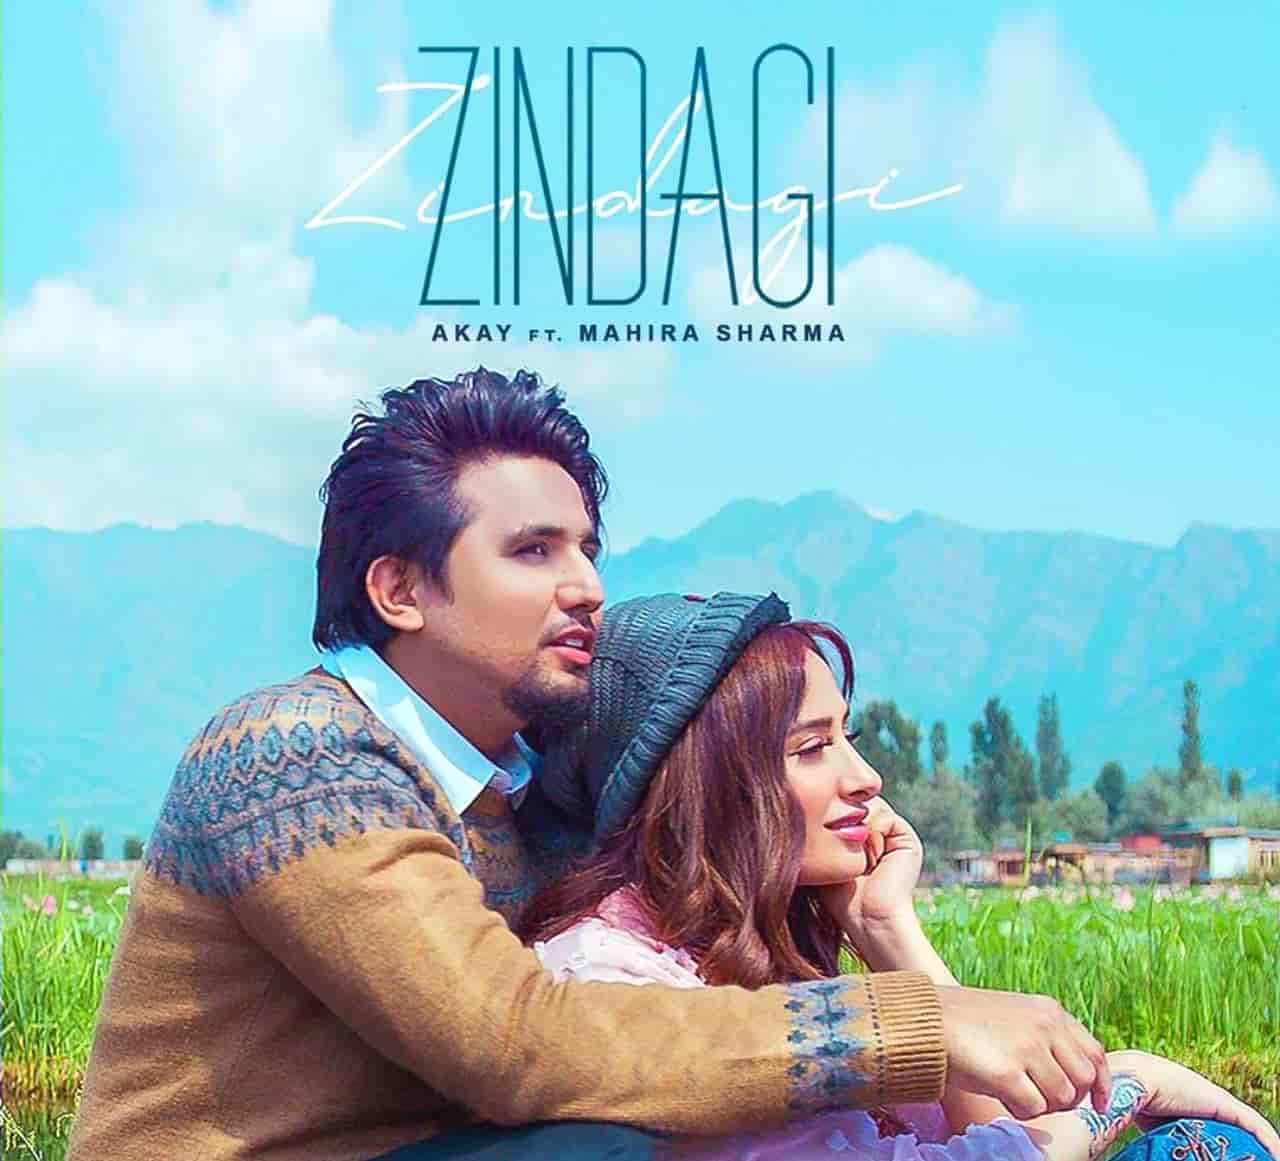 Zindagi Punjabi Song Image Features Mahira Sharma Sung By A Kay